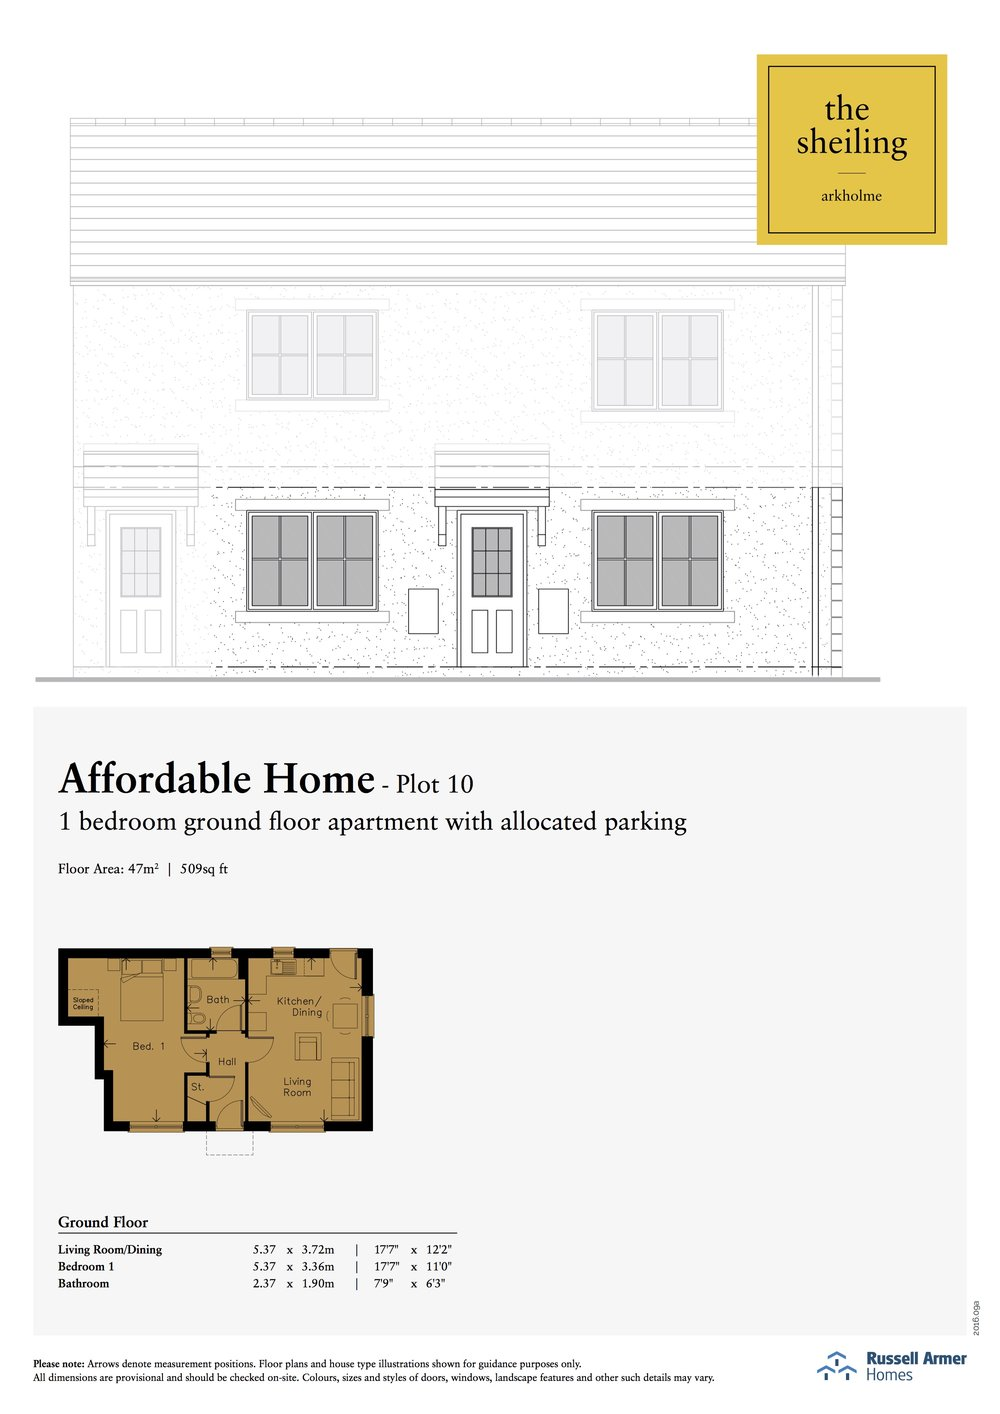 Affordable-Home_Plot-10.jpg